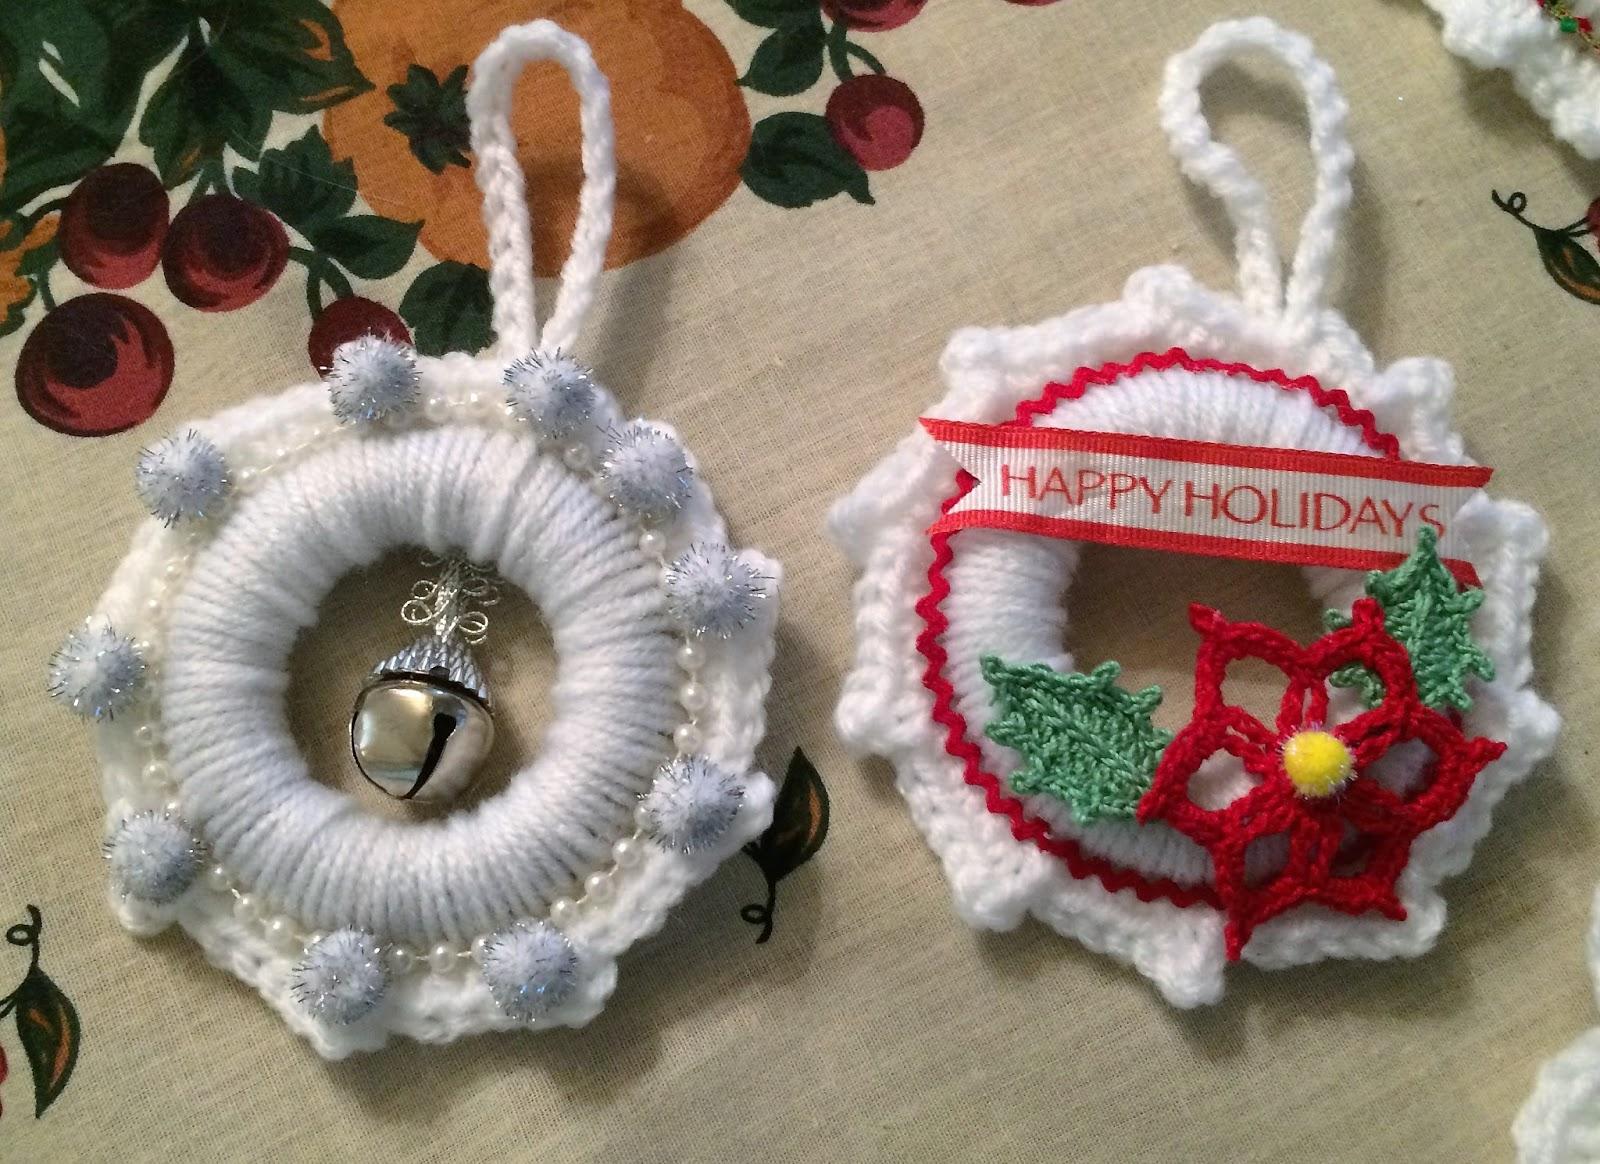 Creative Quest: White Crochet Wreath Ornaments